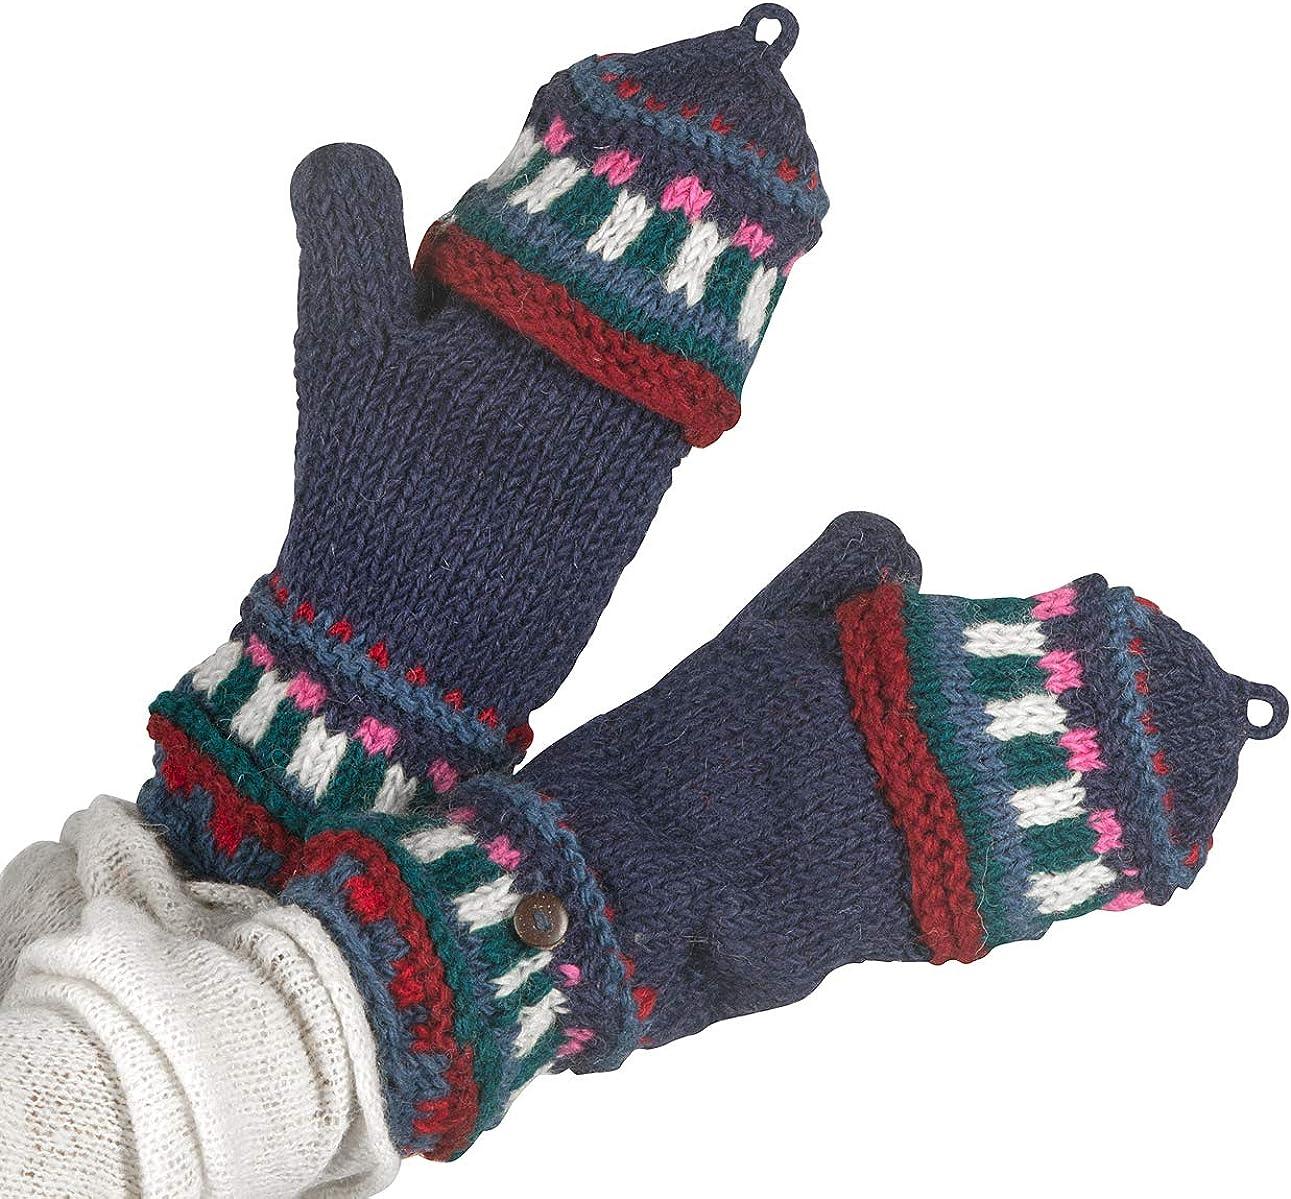 Soft Pure Wool Warm Winter Convertible Gloves Mittens Grey Snow Fleece Windproof